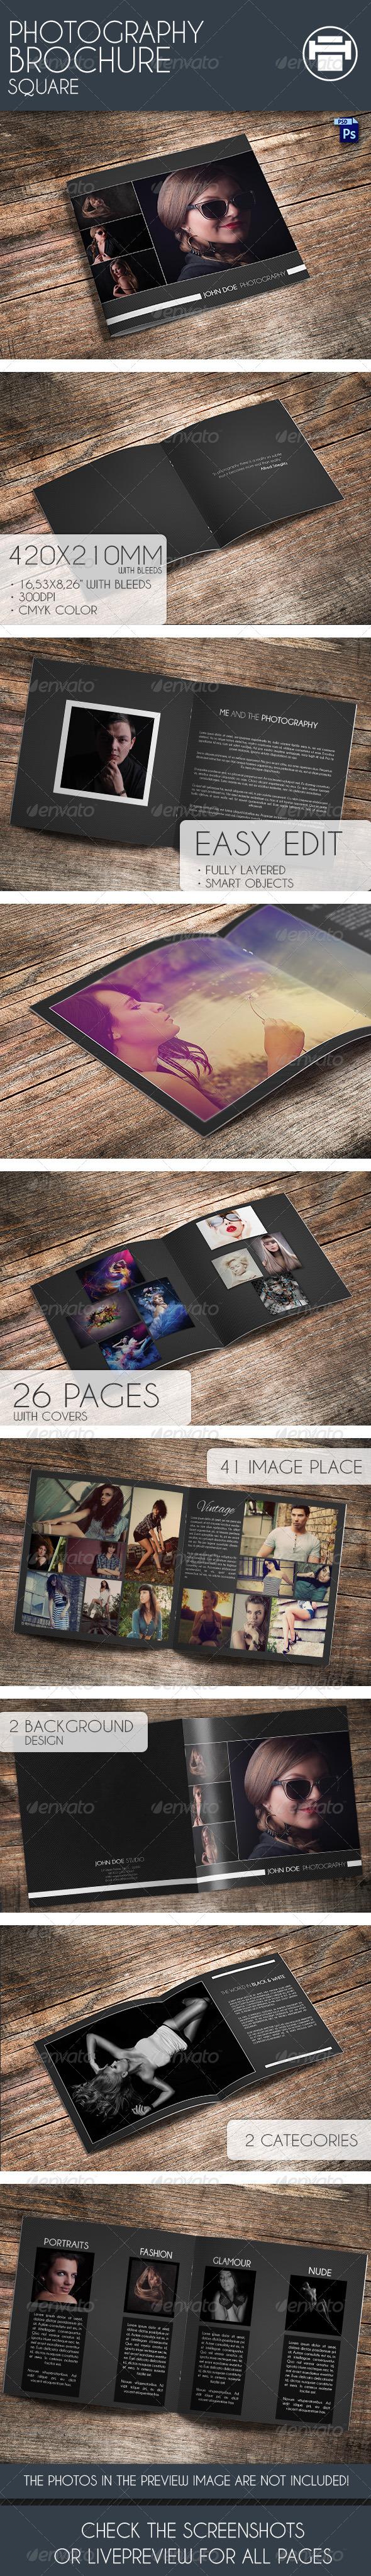 Photography Bochure Square - Portfolio Brochures